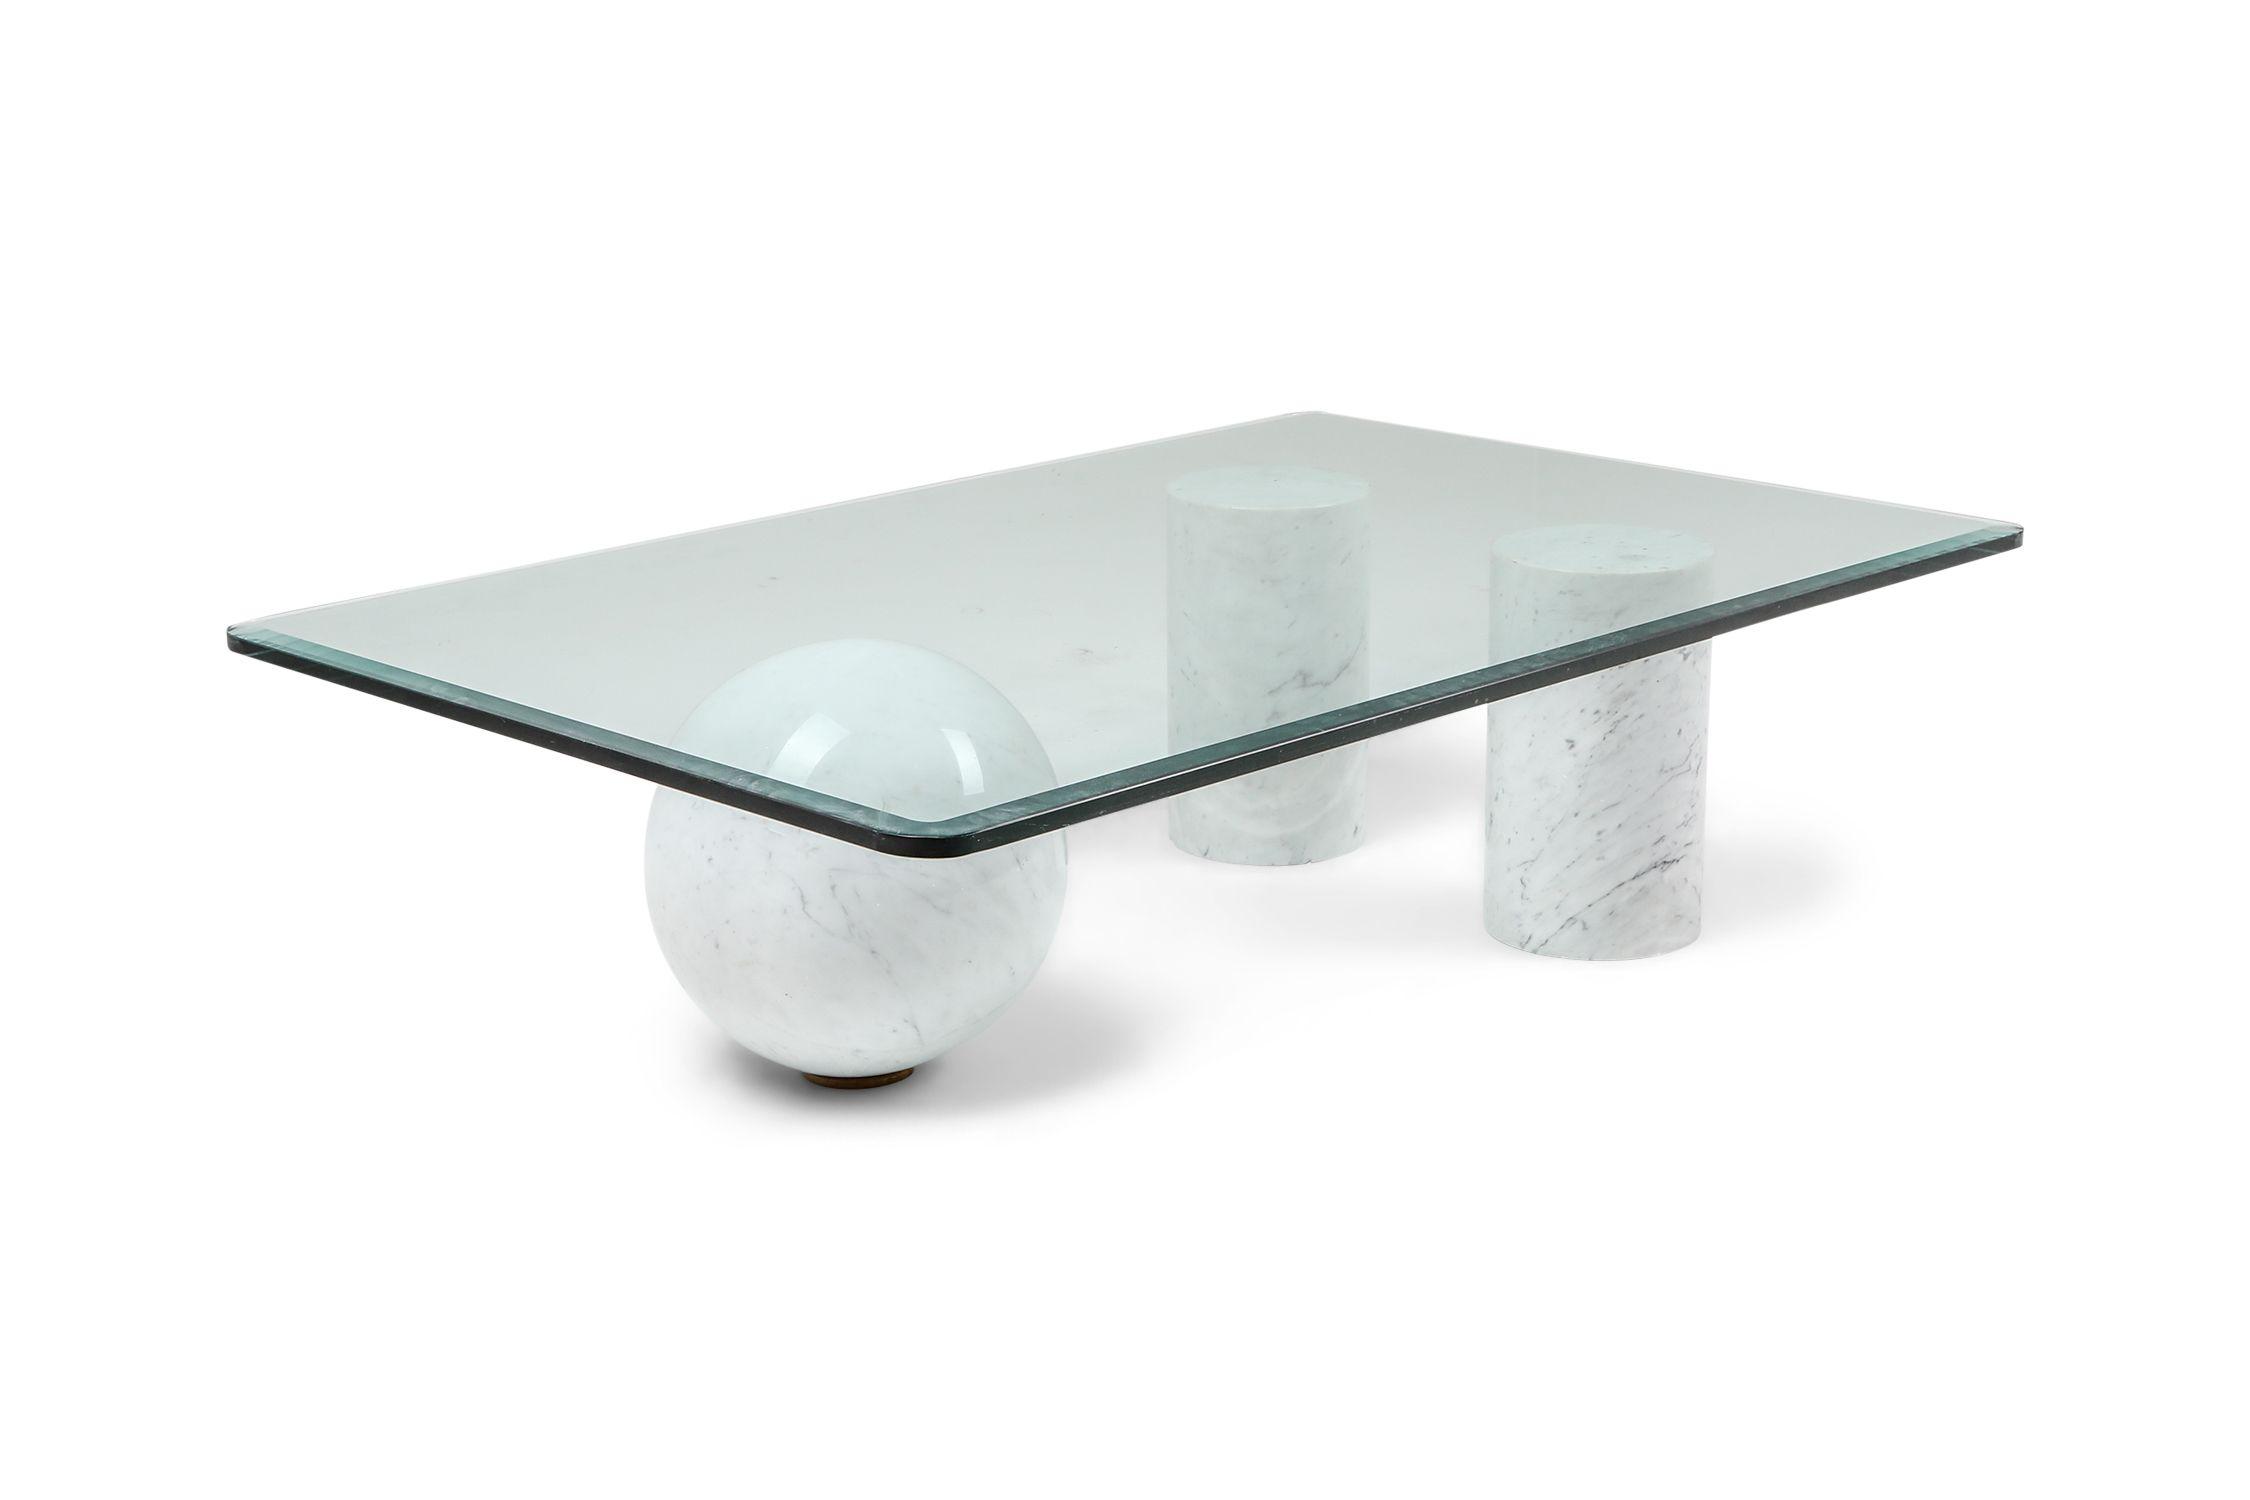 Vintage Italian White Marble Coffee Table By Massimo Vignelli 1970s Design Market